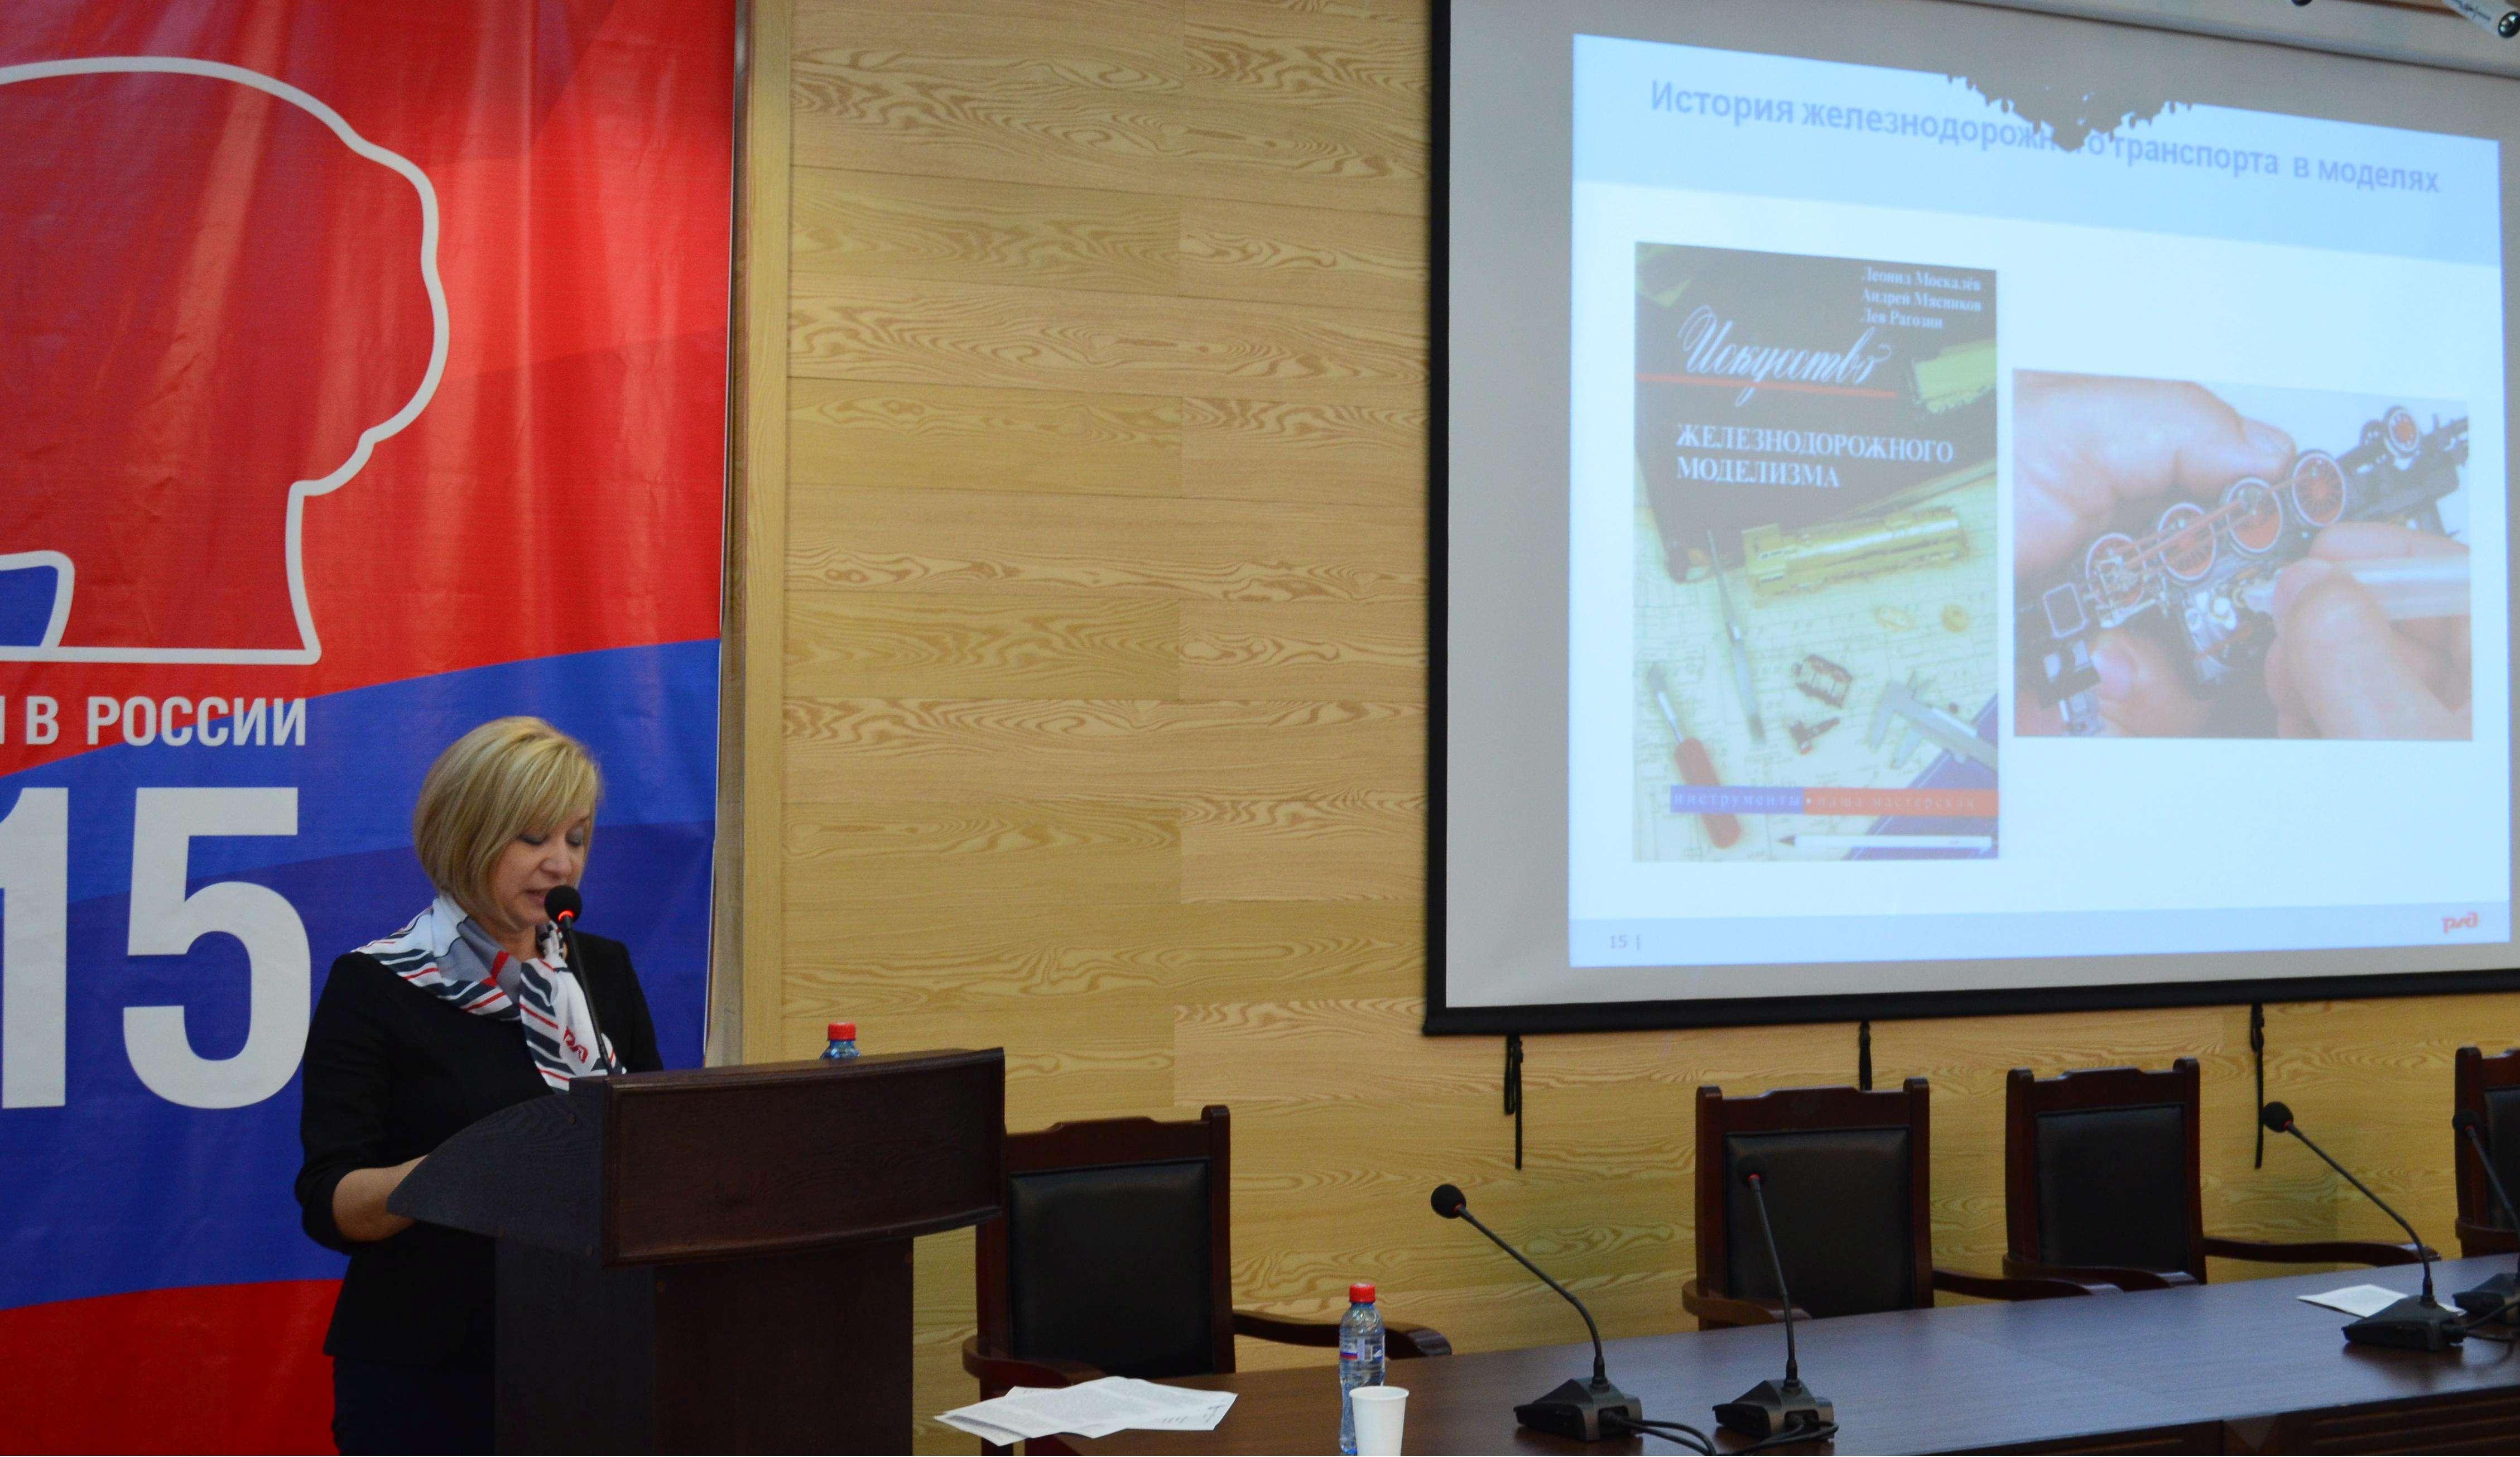 корпоративная культура в россии презентация